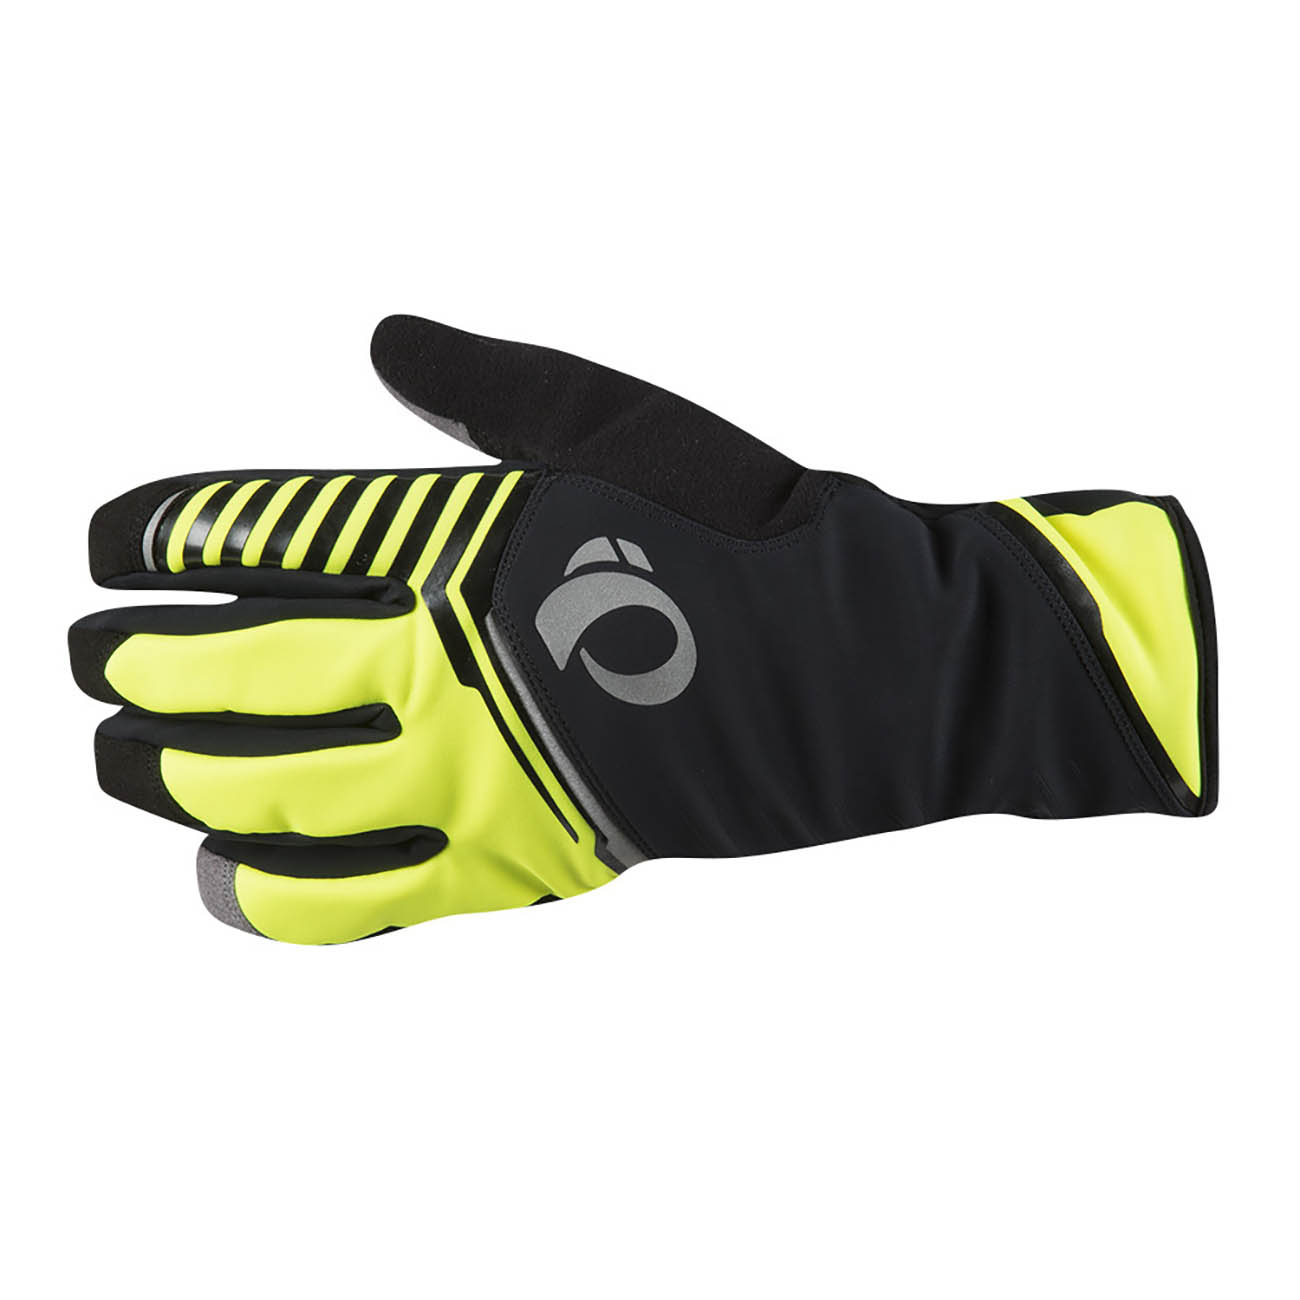 PEARL iZUMi PRO AMFIB rukavice, SCREAMING žlutá, L